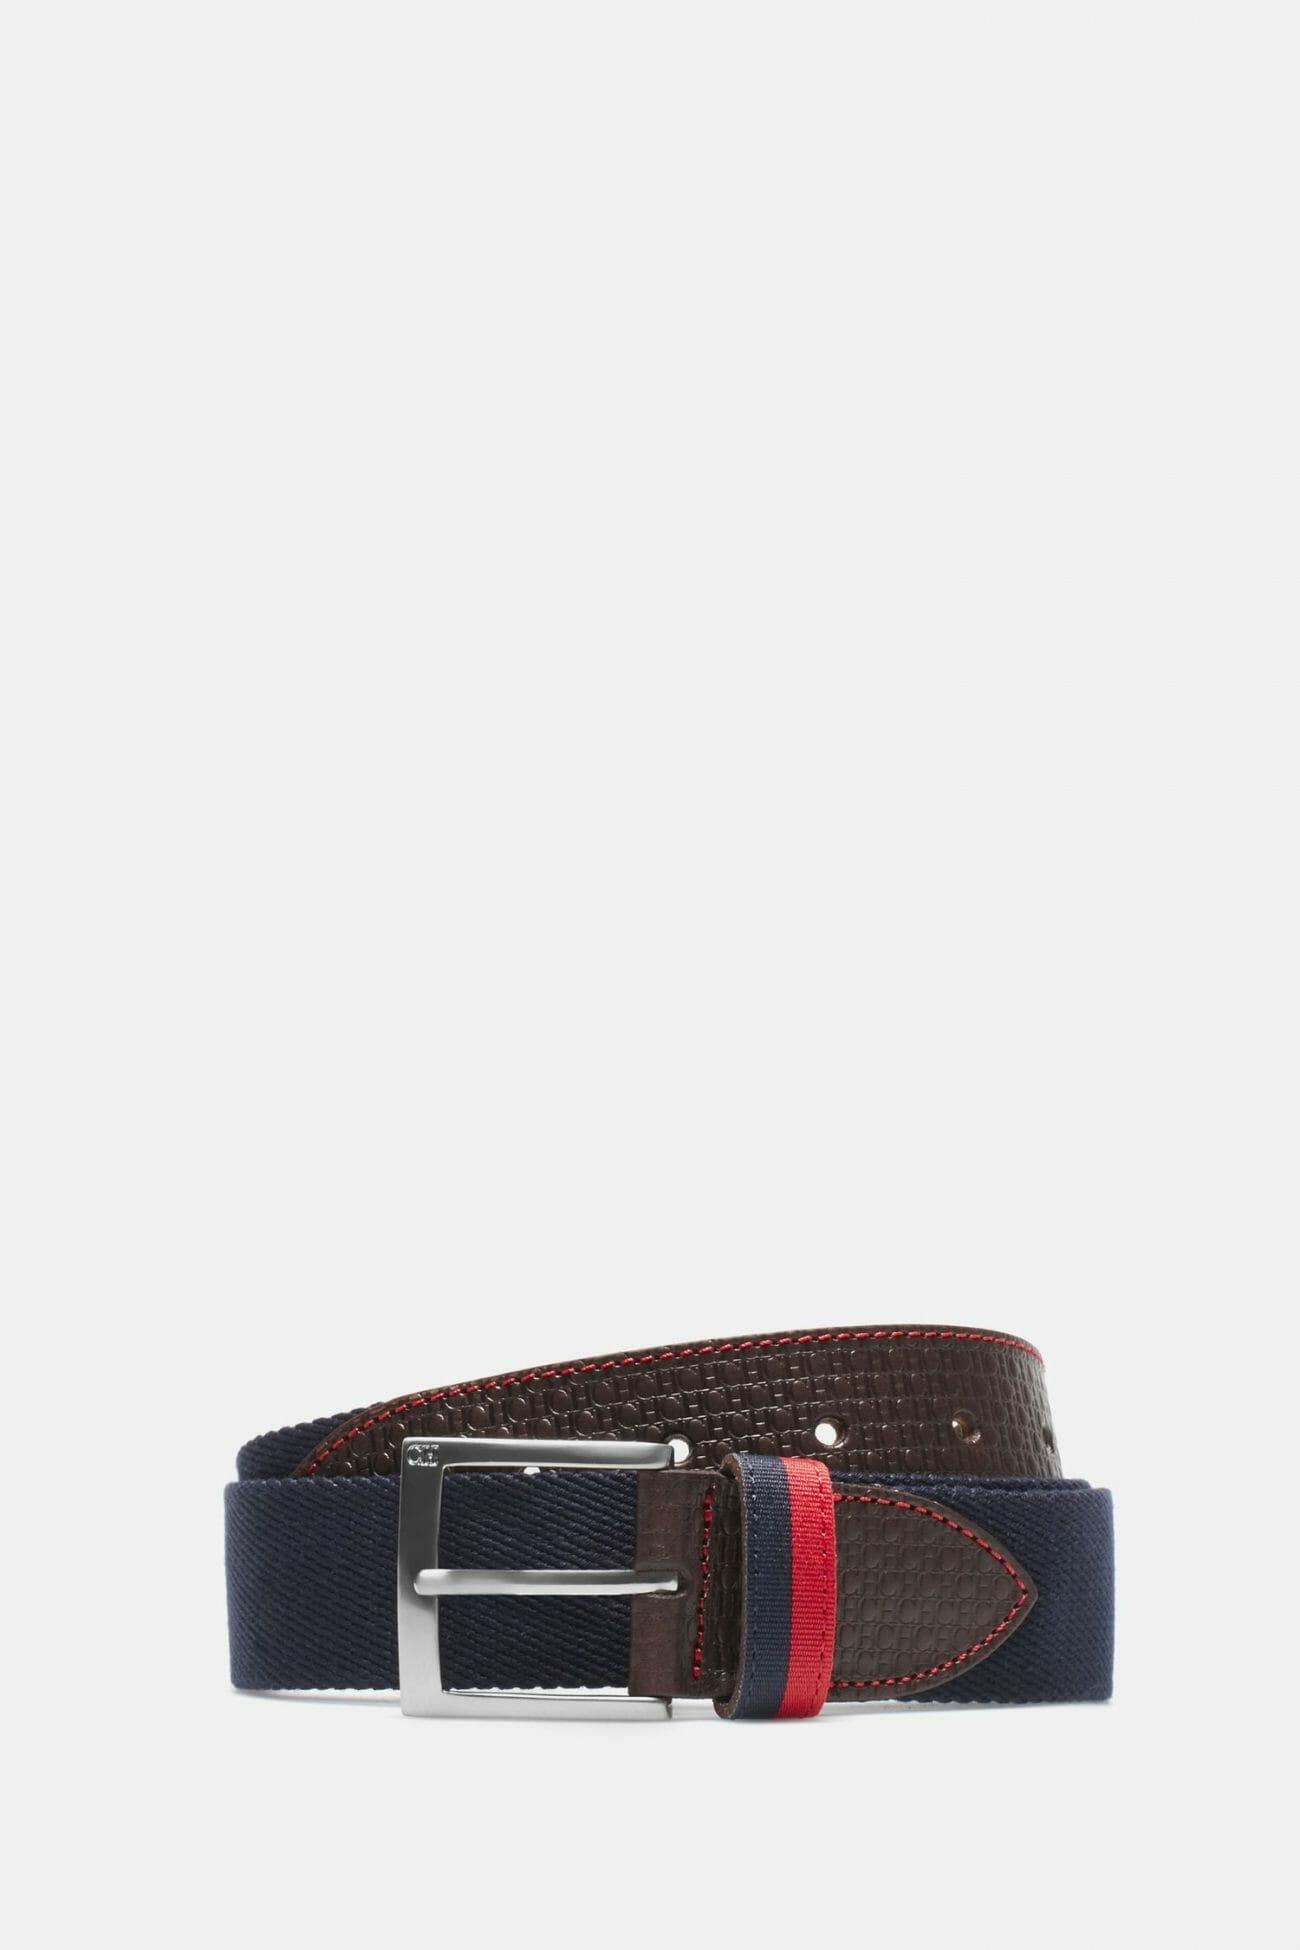 CH-Carolina-herrera-men-accessories-look-41